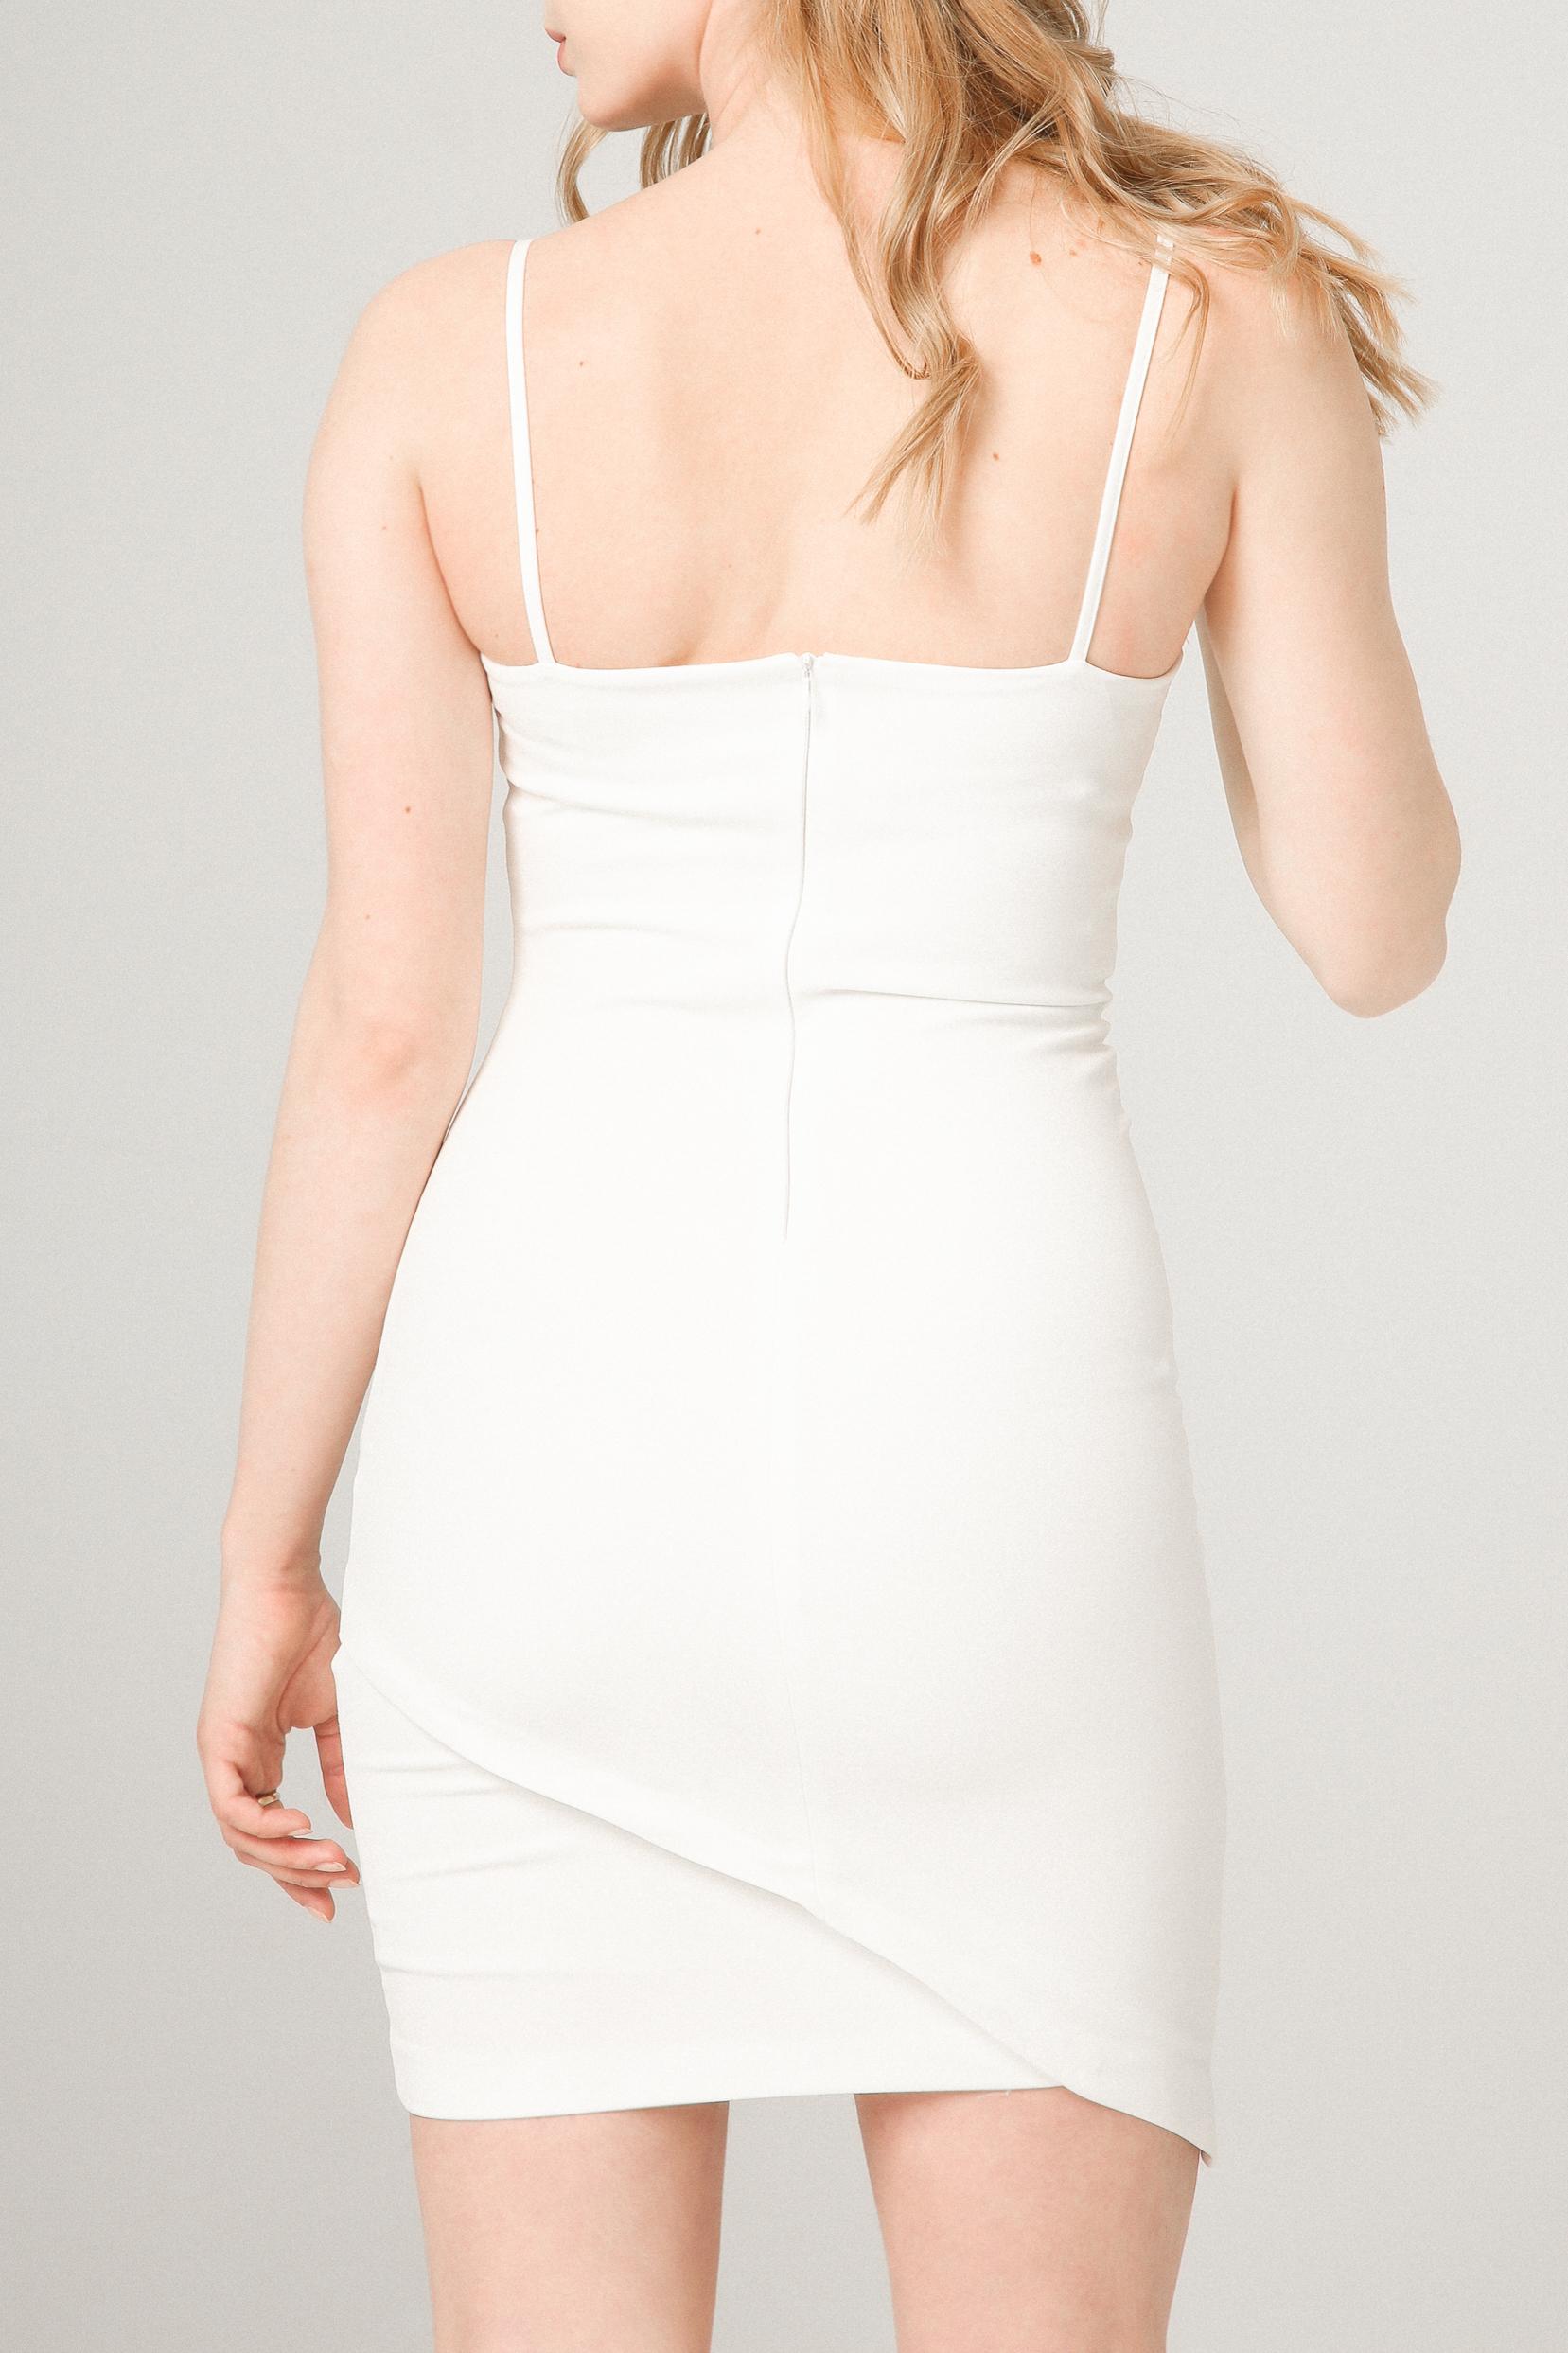 Robes  Fontana 2.0 VERIANA white